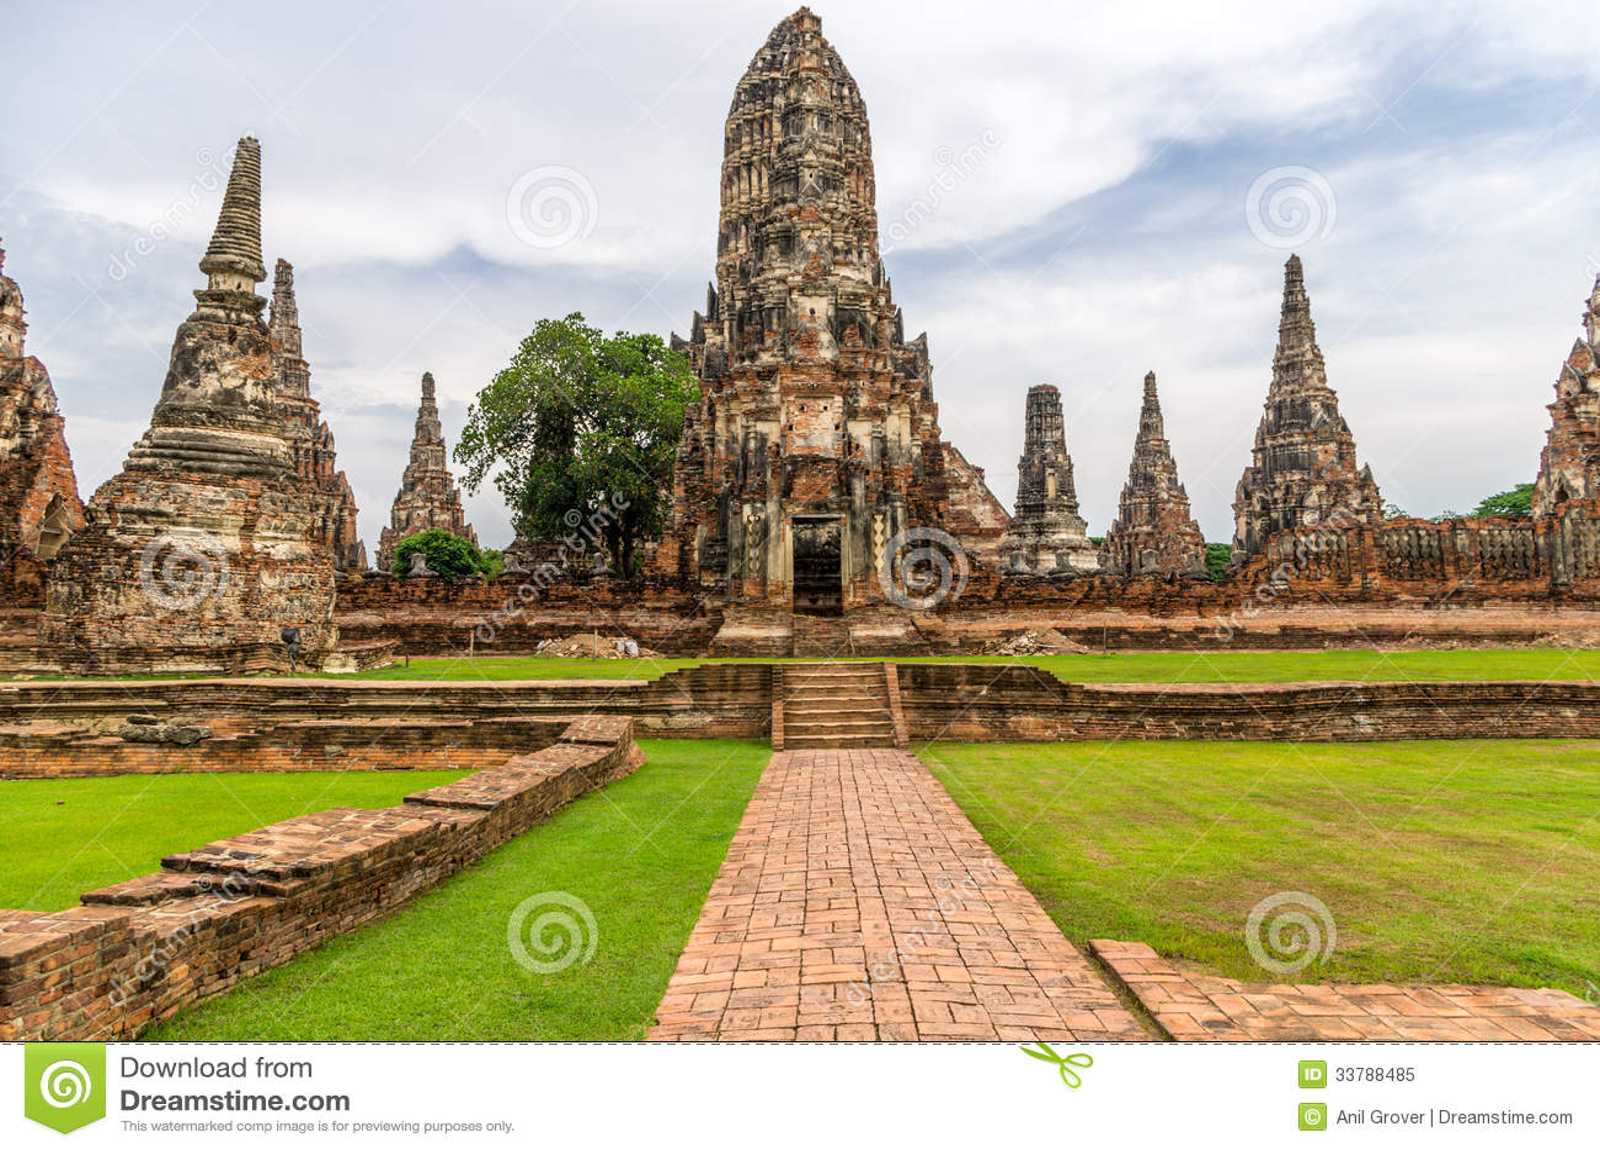 Wat Chaiwatthanaram In The City Of Ayutthaya, Thailand. It ...